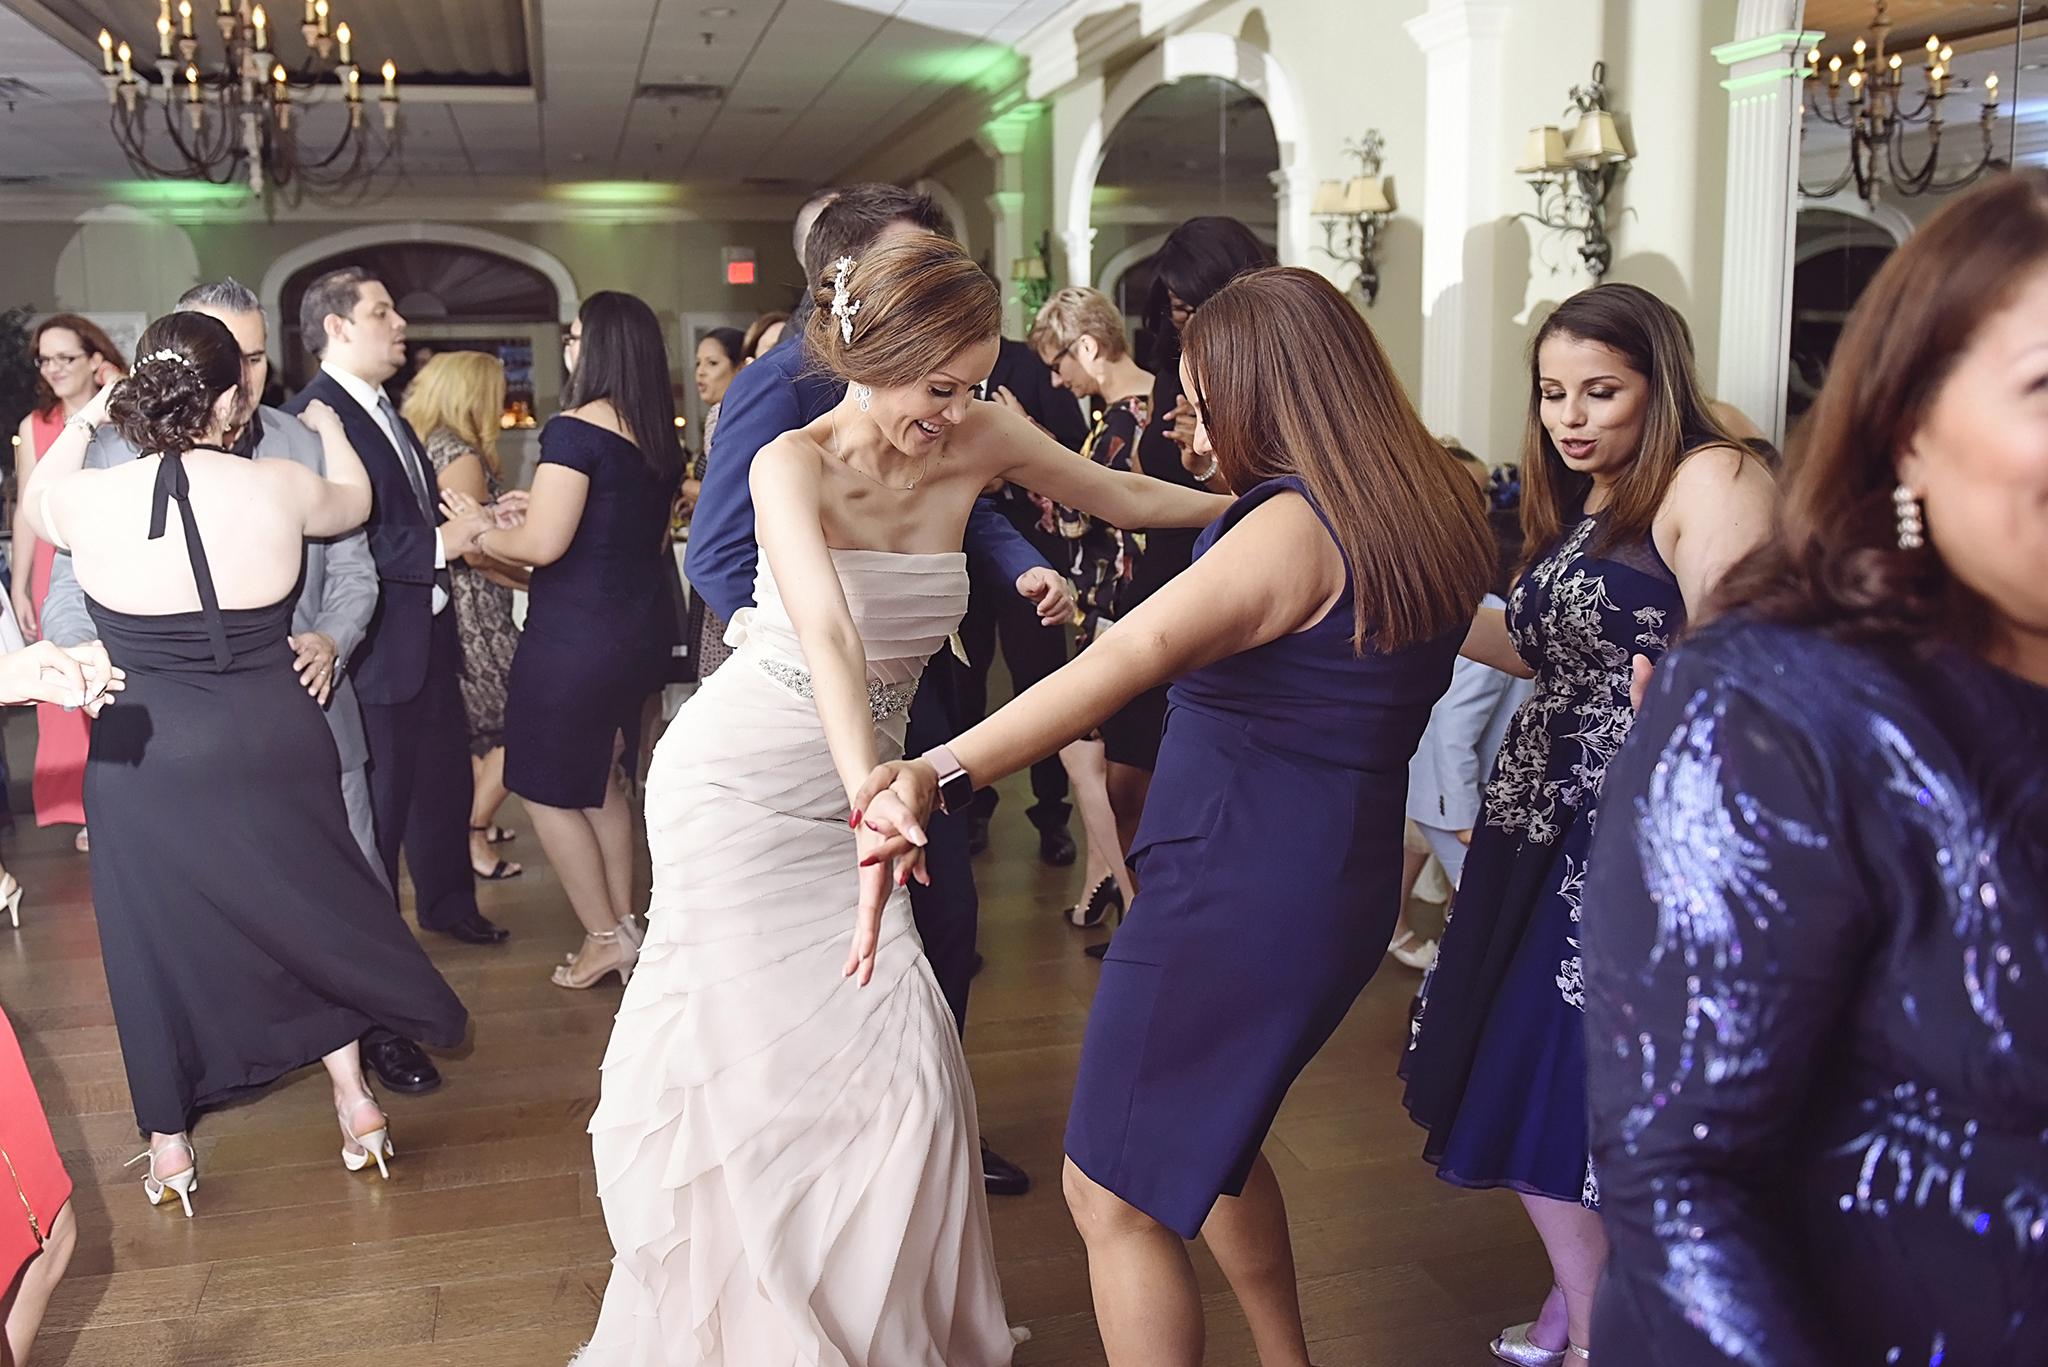 NJ-NY-wedding-photographer-140NJ-NY-wedding-photographer-140NJ-NY-WEDDING-PHOTOGRAPHER-140.JPG